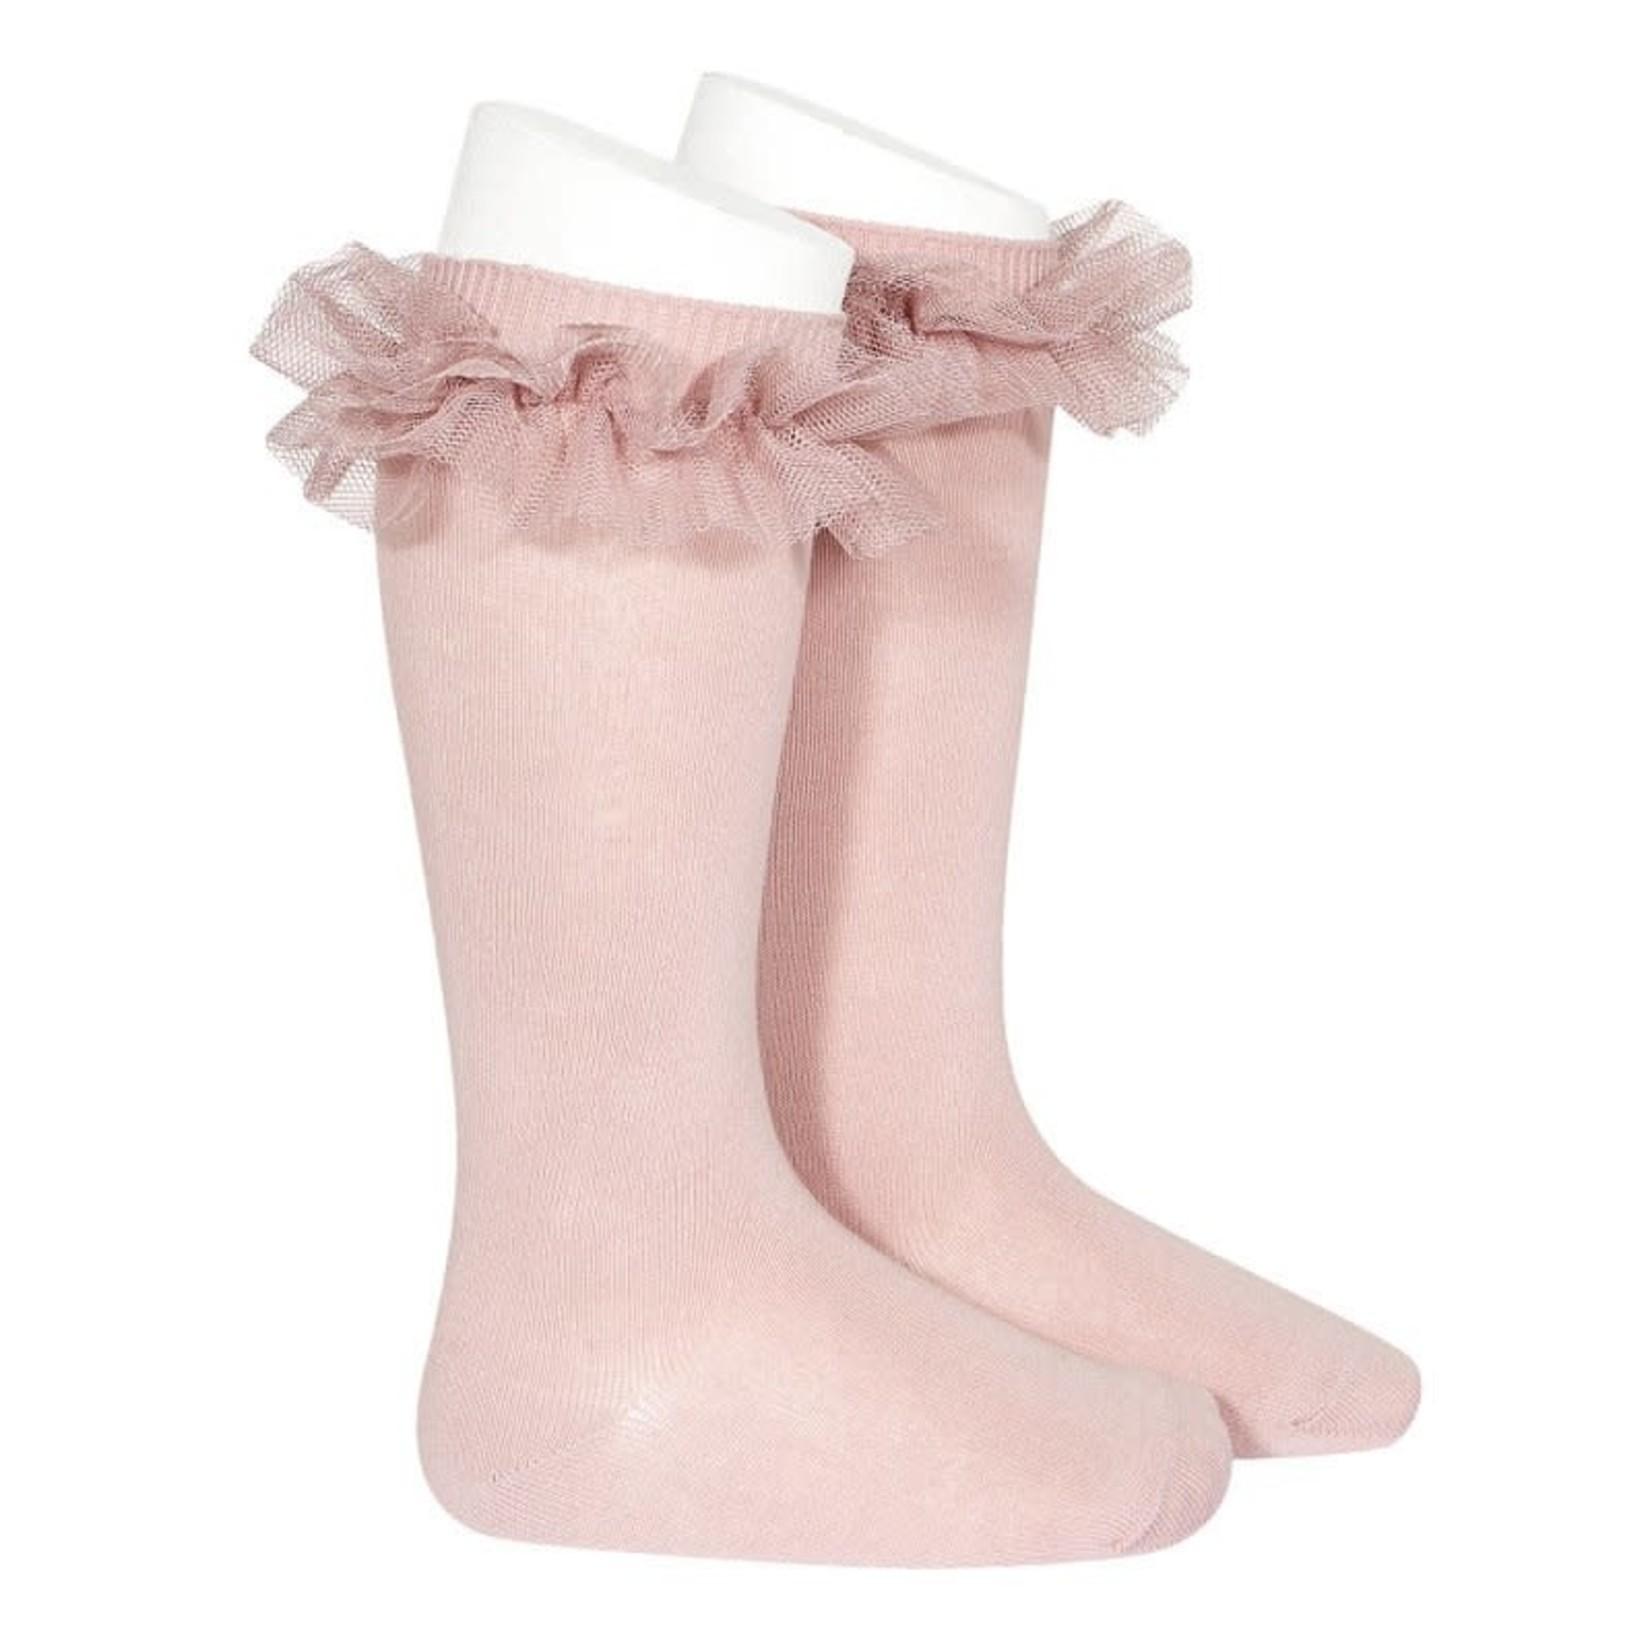 Condor Ruffle Socks Knee High - Pale Pink